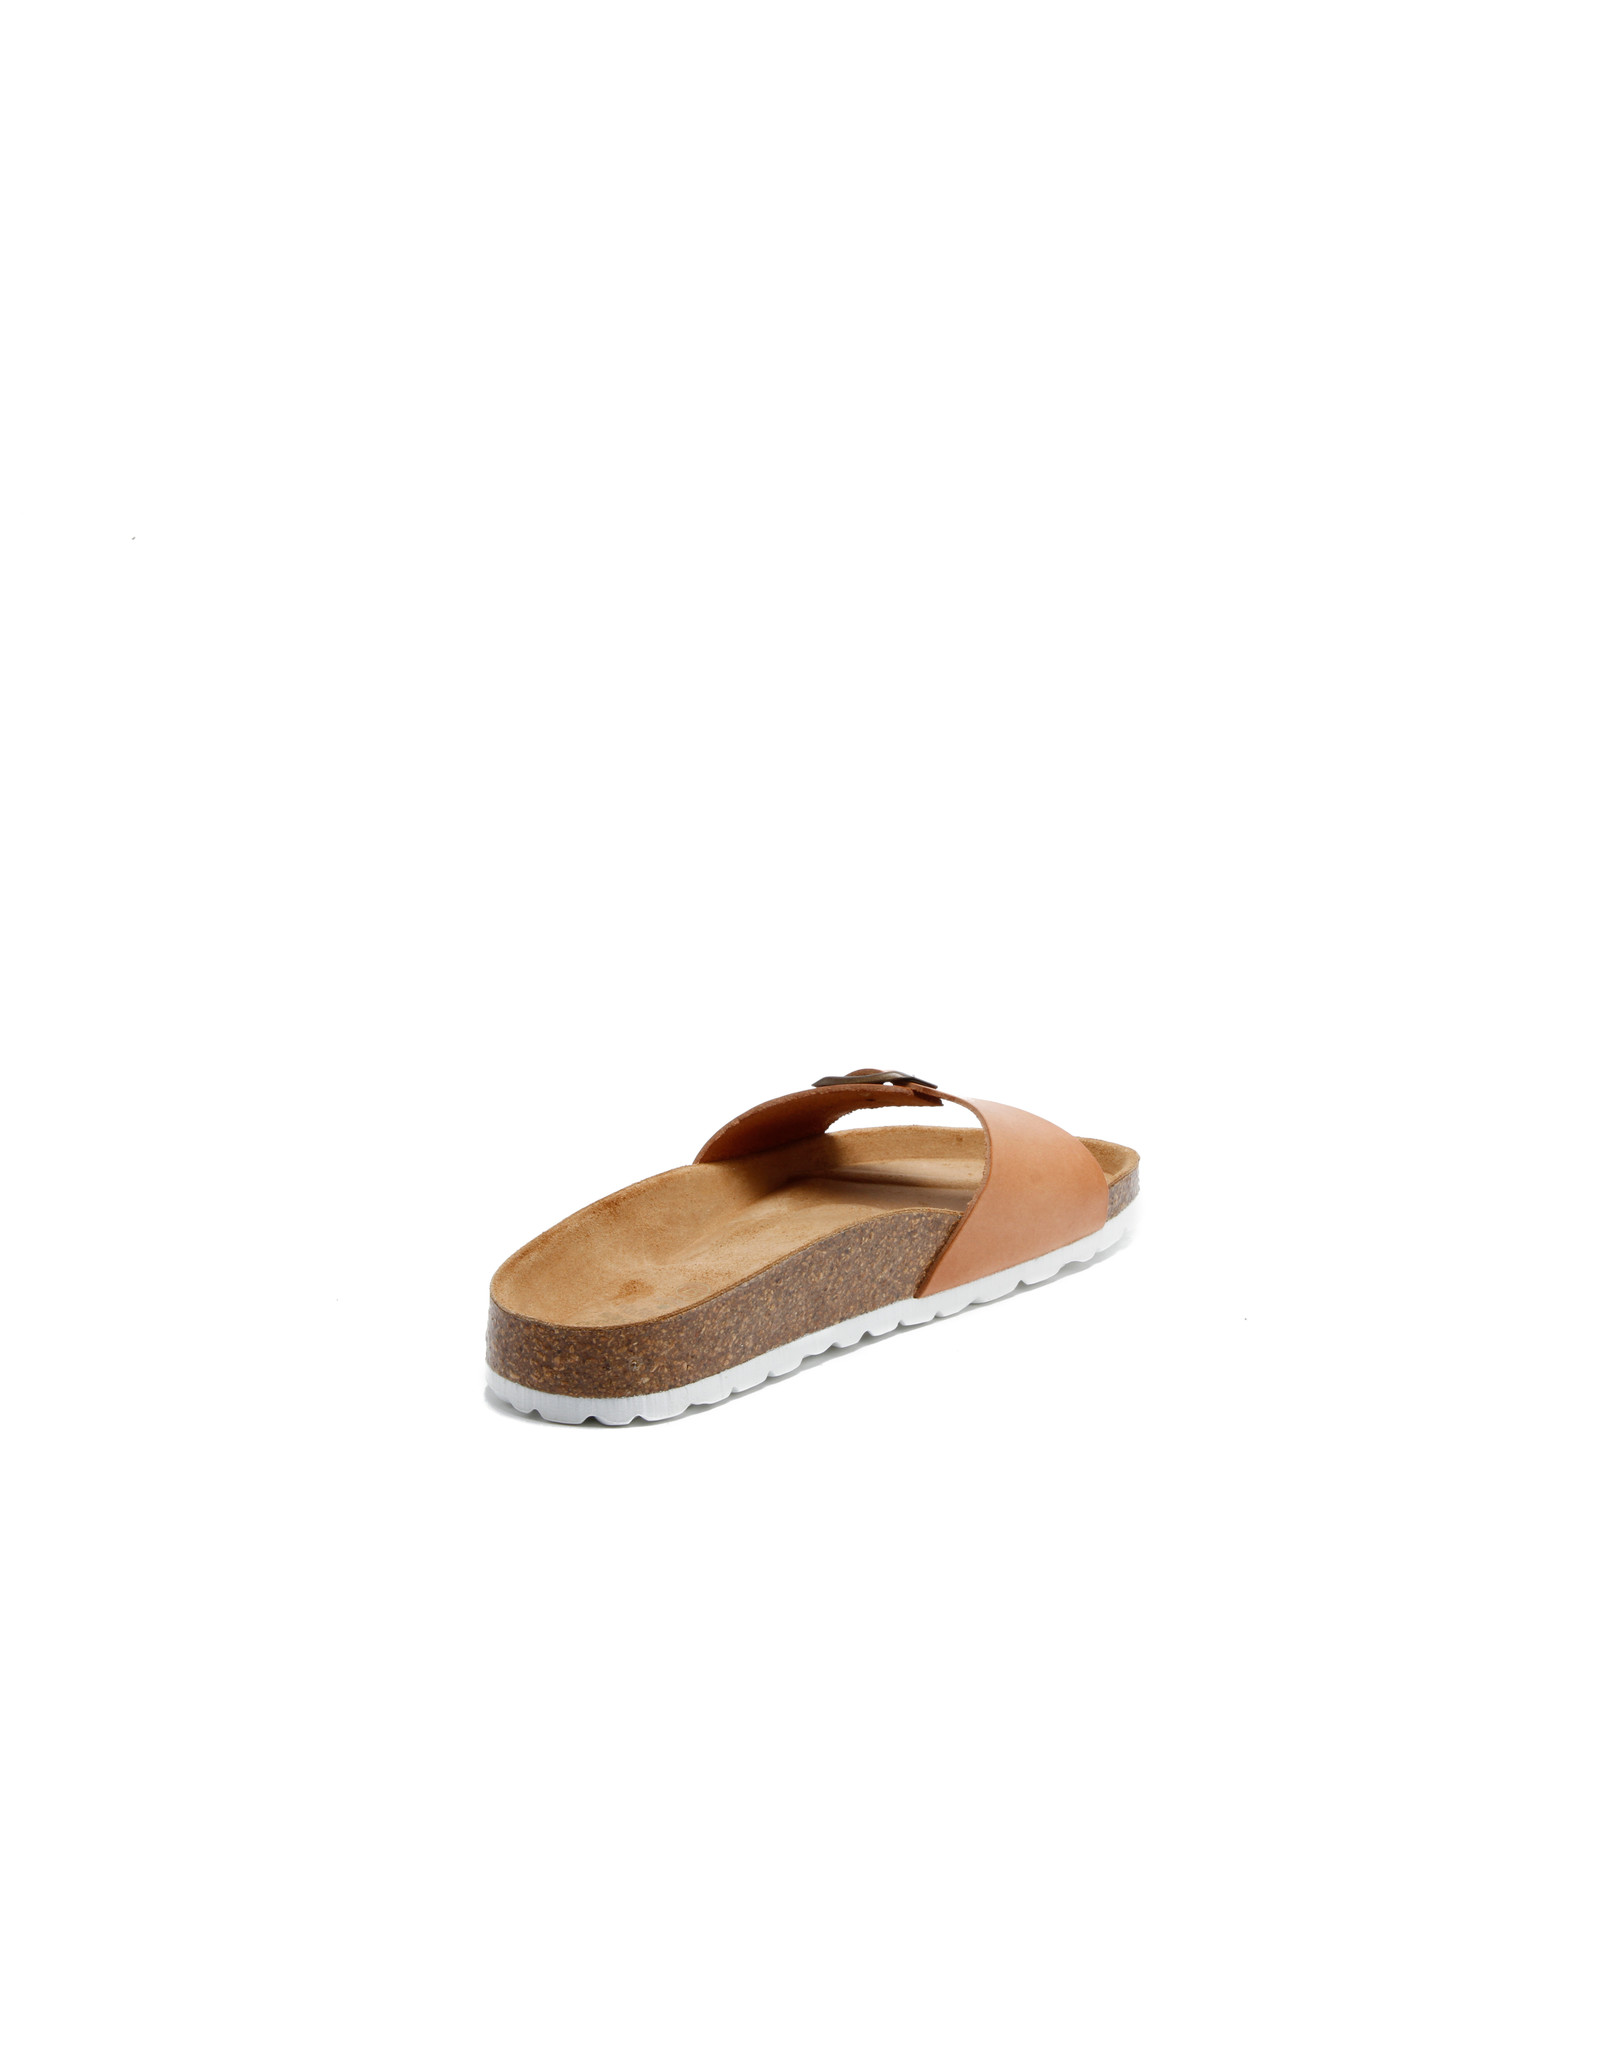 Grand Step Shoes Linda Schläppchen